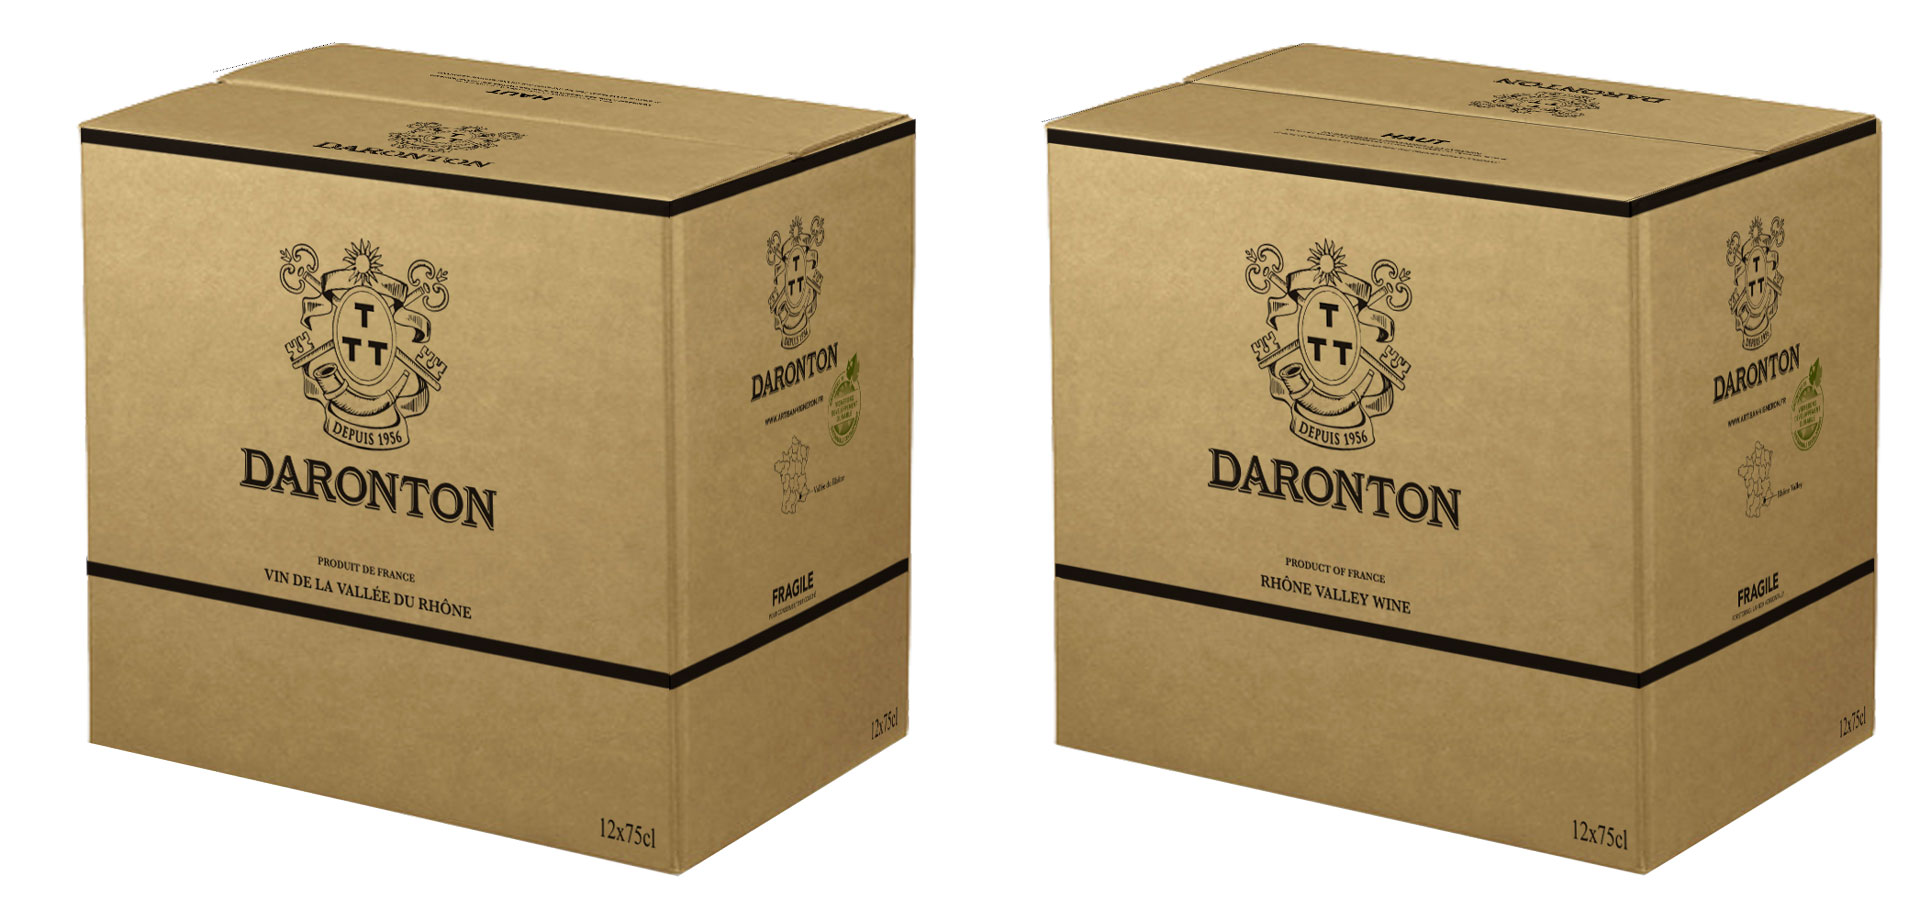 Carton Daronton